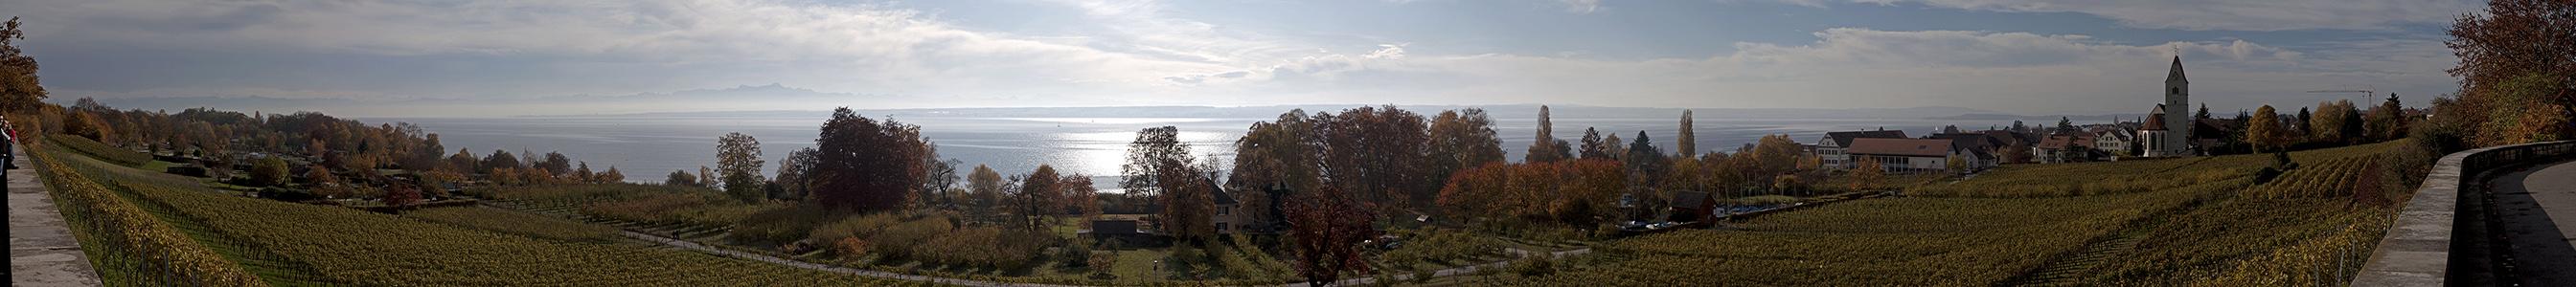 Hagnau am Bodensee Bodensee